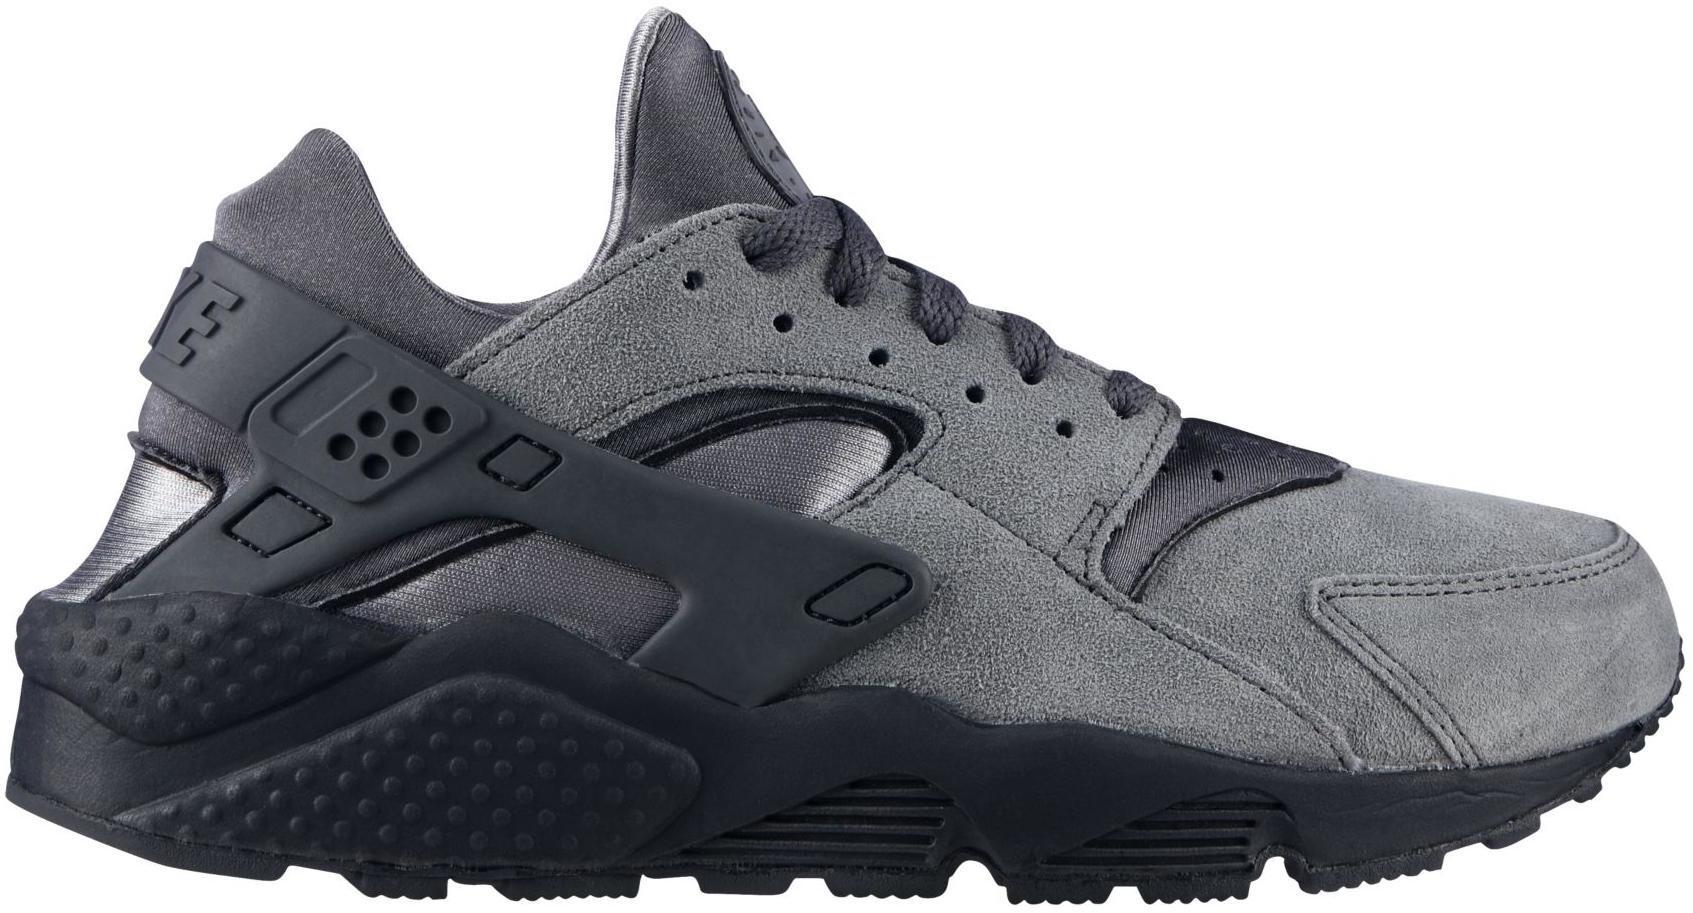 Nike Air Huarache Cool Grey Anthracite